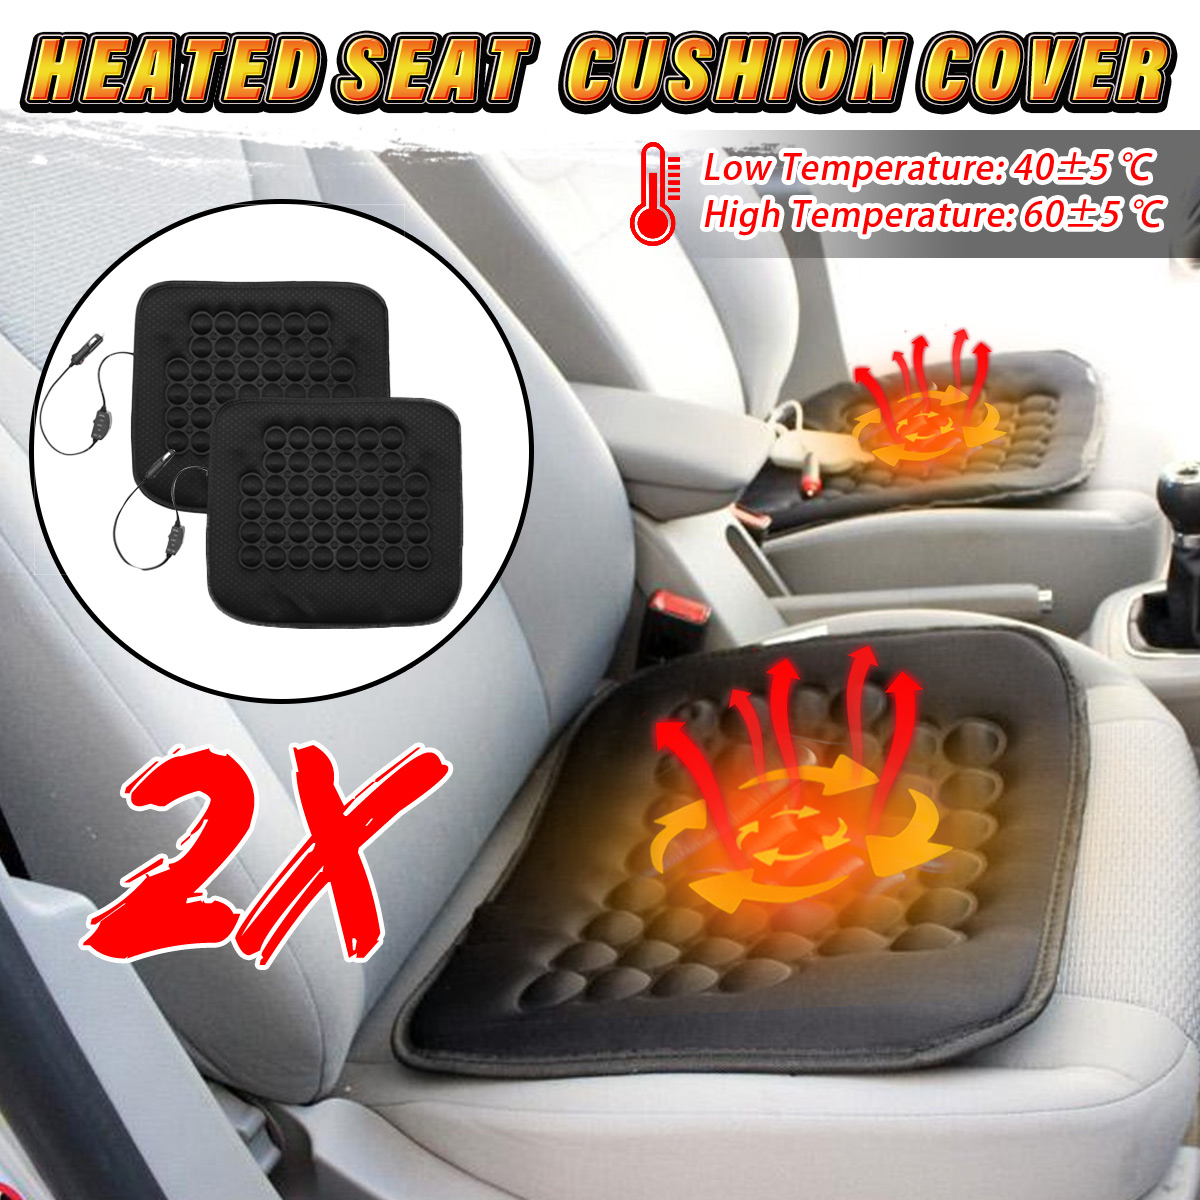 Electric Car Front Seat Heated Cushion Thermal Heating Pad Black 12V 30W  Winter Warmer Cover Black Vehicle Van Auto SUV Truck Caravan Fiber Cloth US